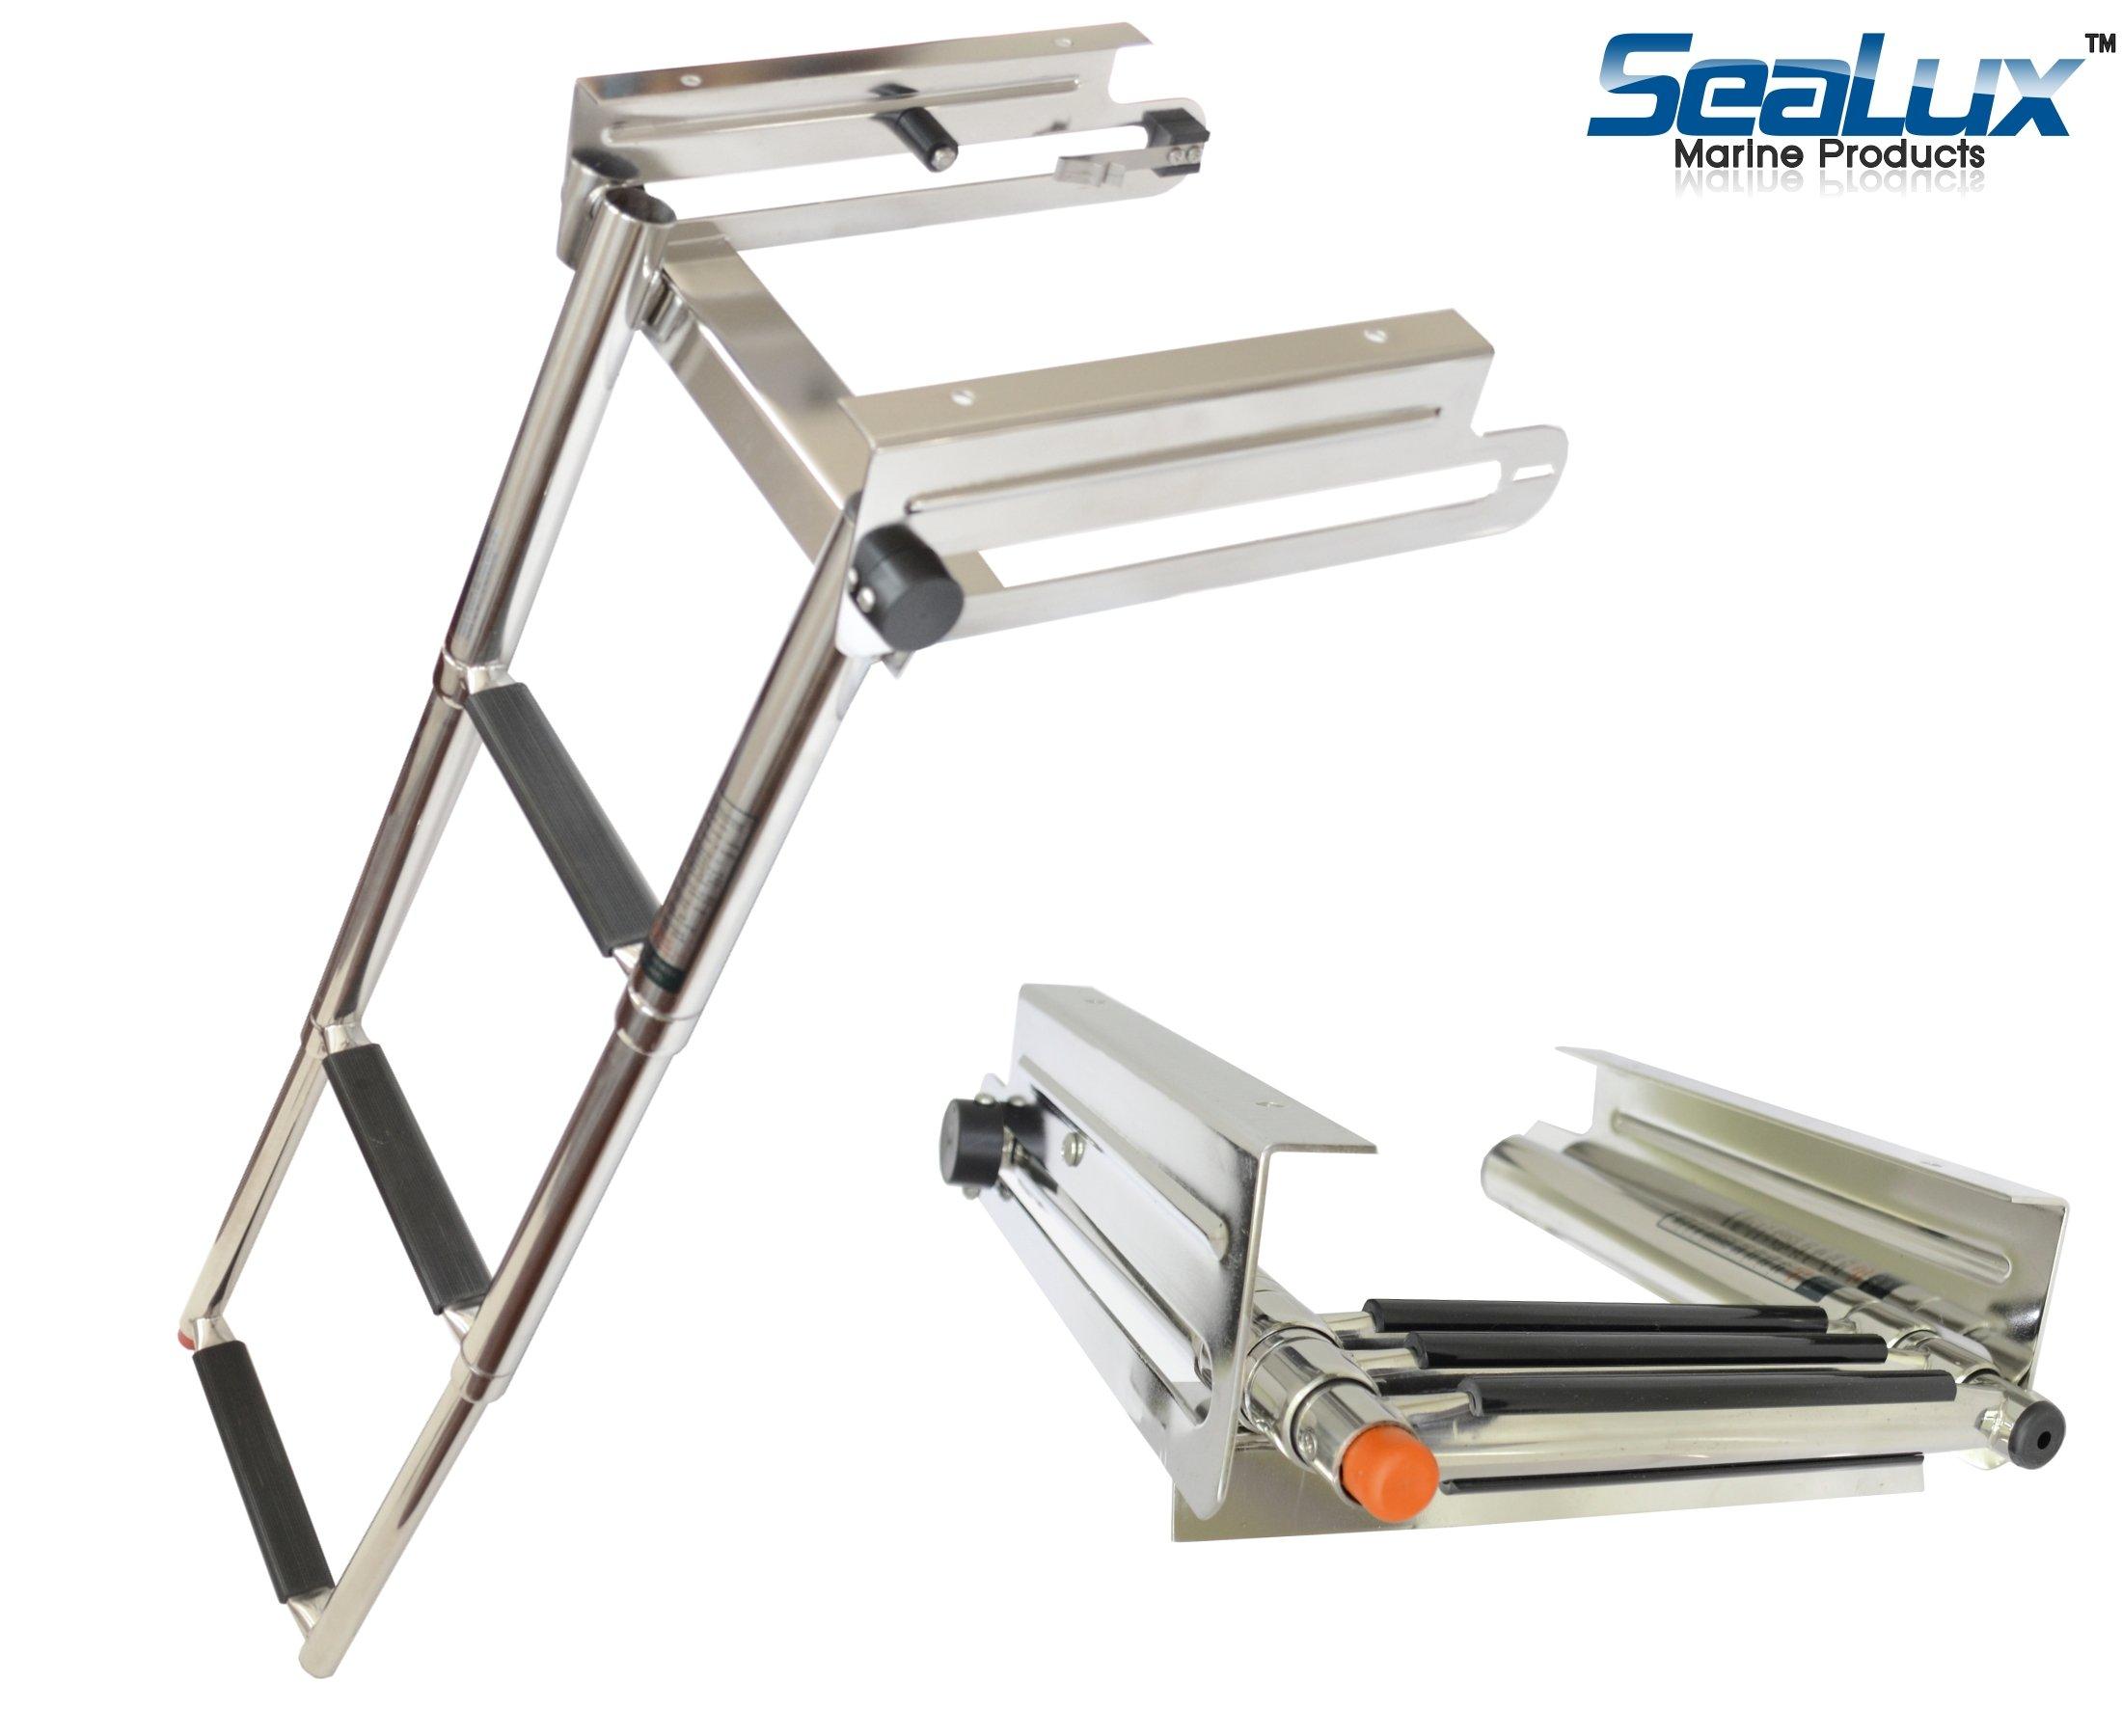 SeaLux Stainless Steel Pop-N-Lock Boarding 3-Step Undermount Sliding Marine Boat Telescoping Swim Ladder by SeaLux Marine Products